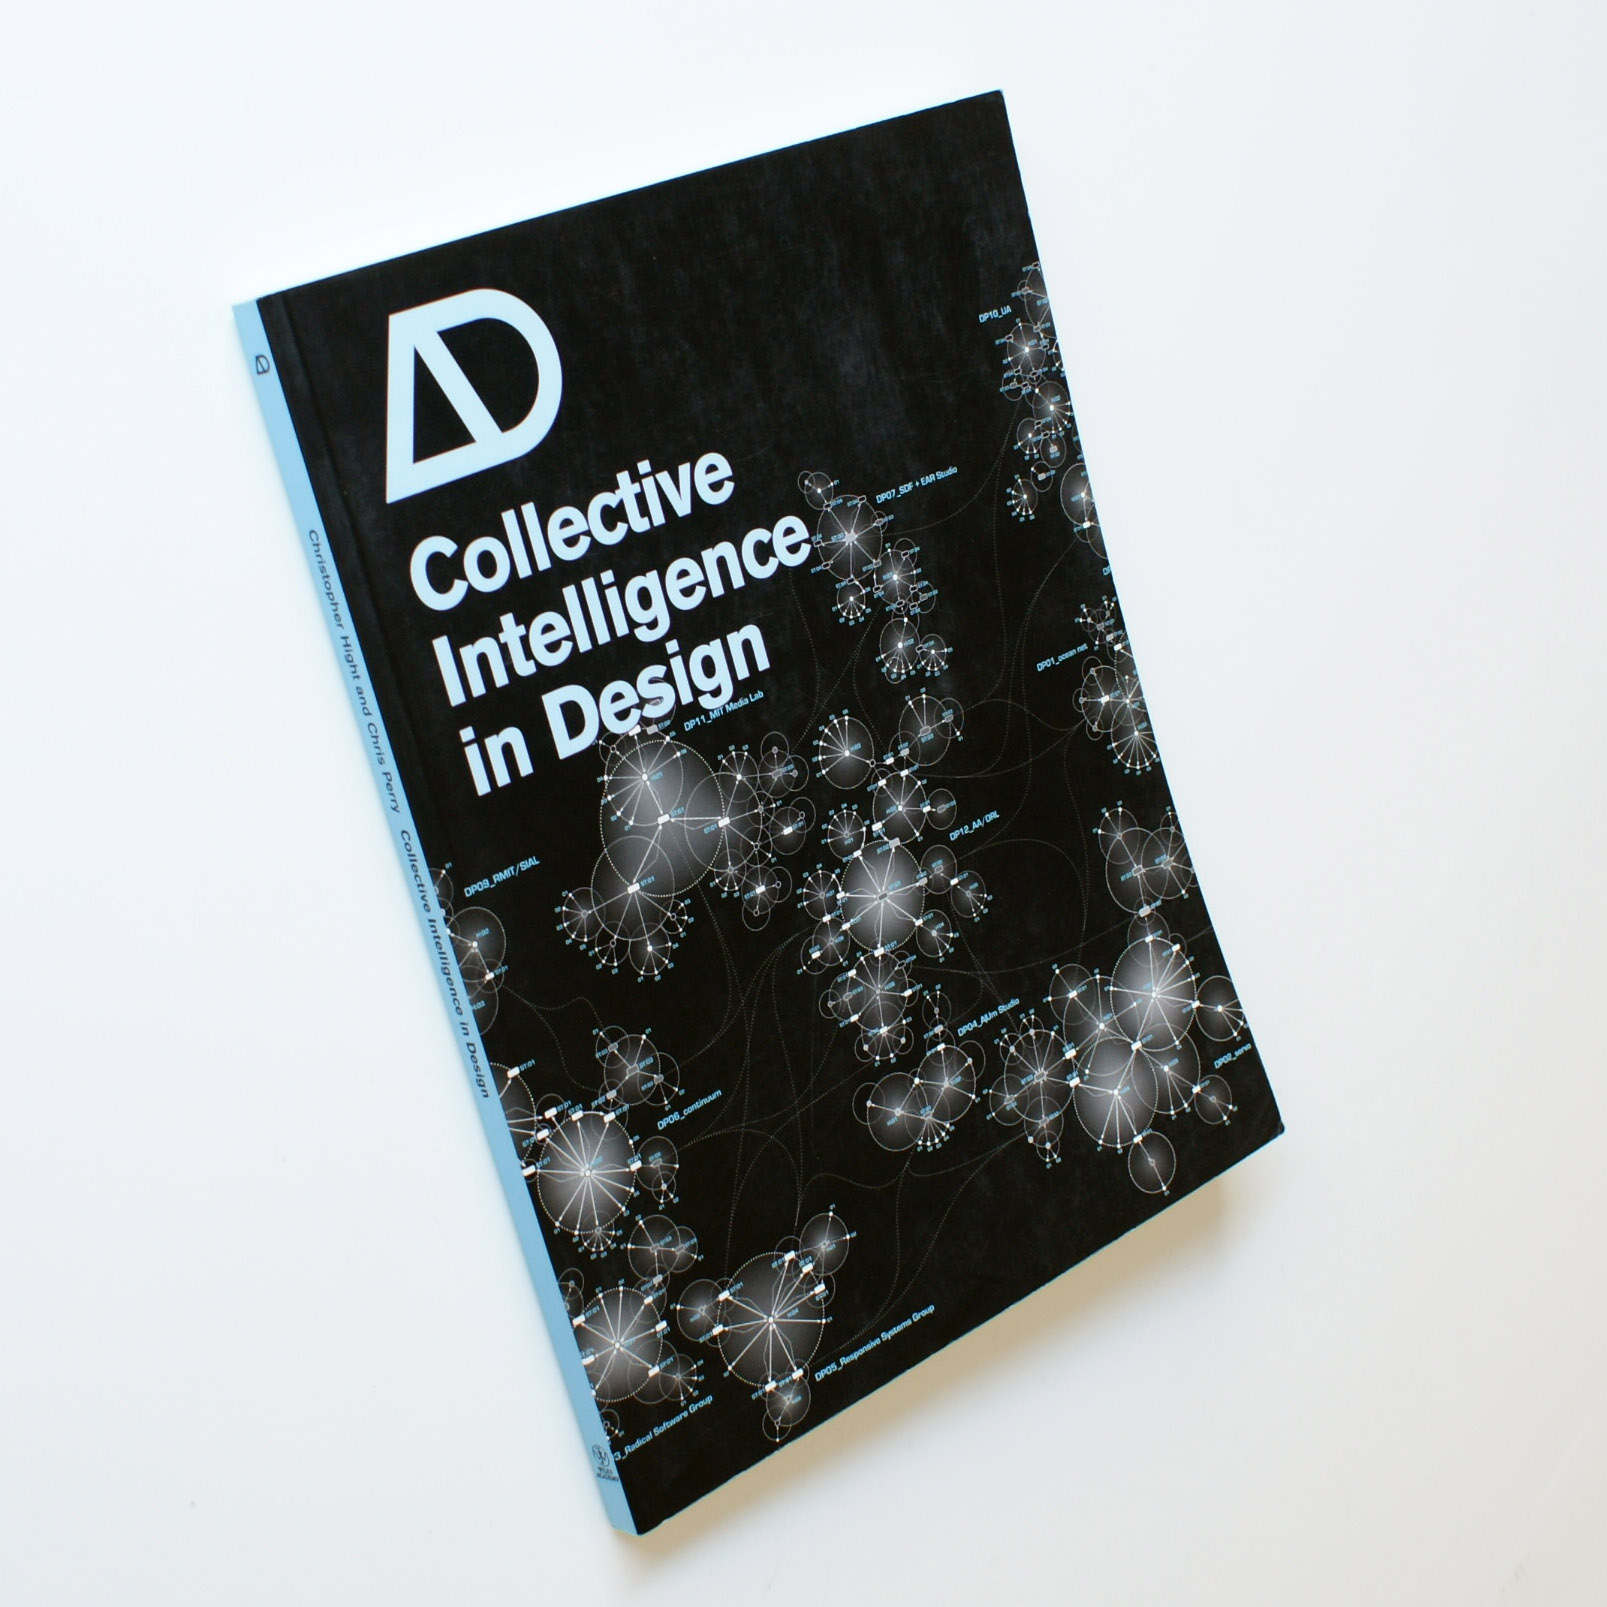 DSC09121.FIX.jpg